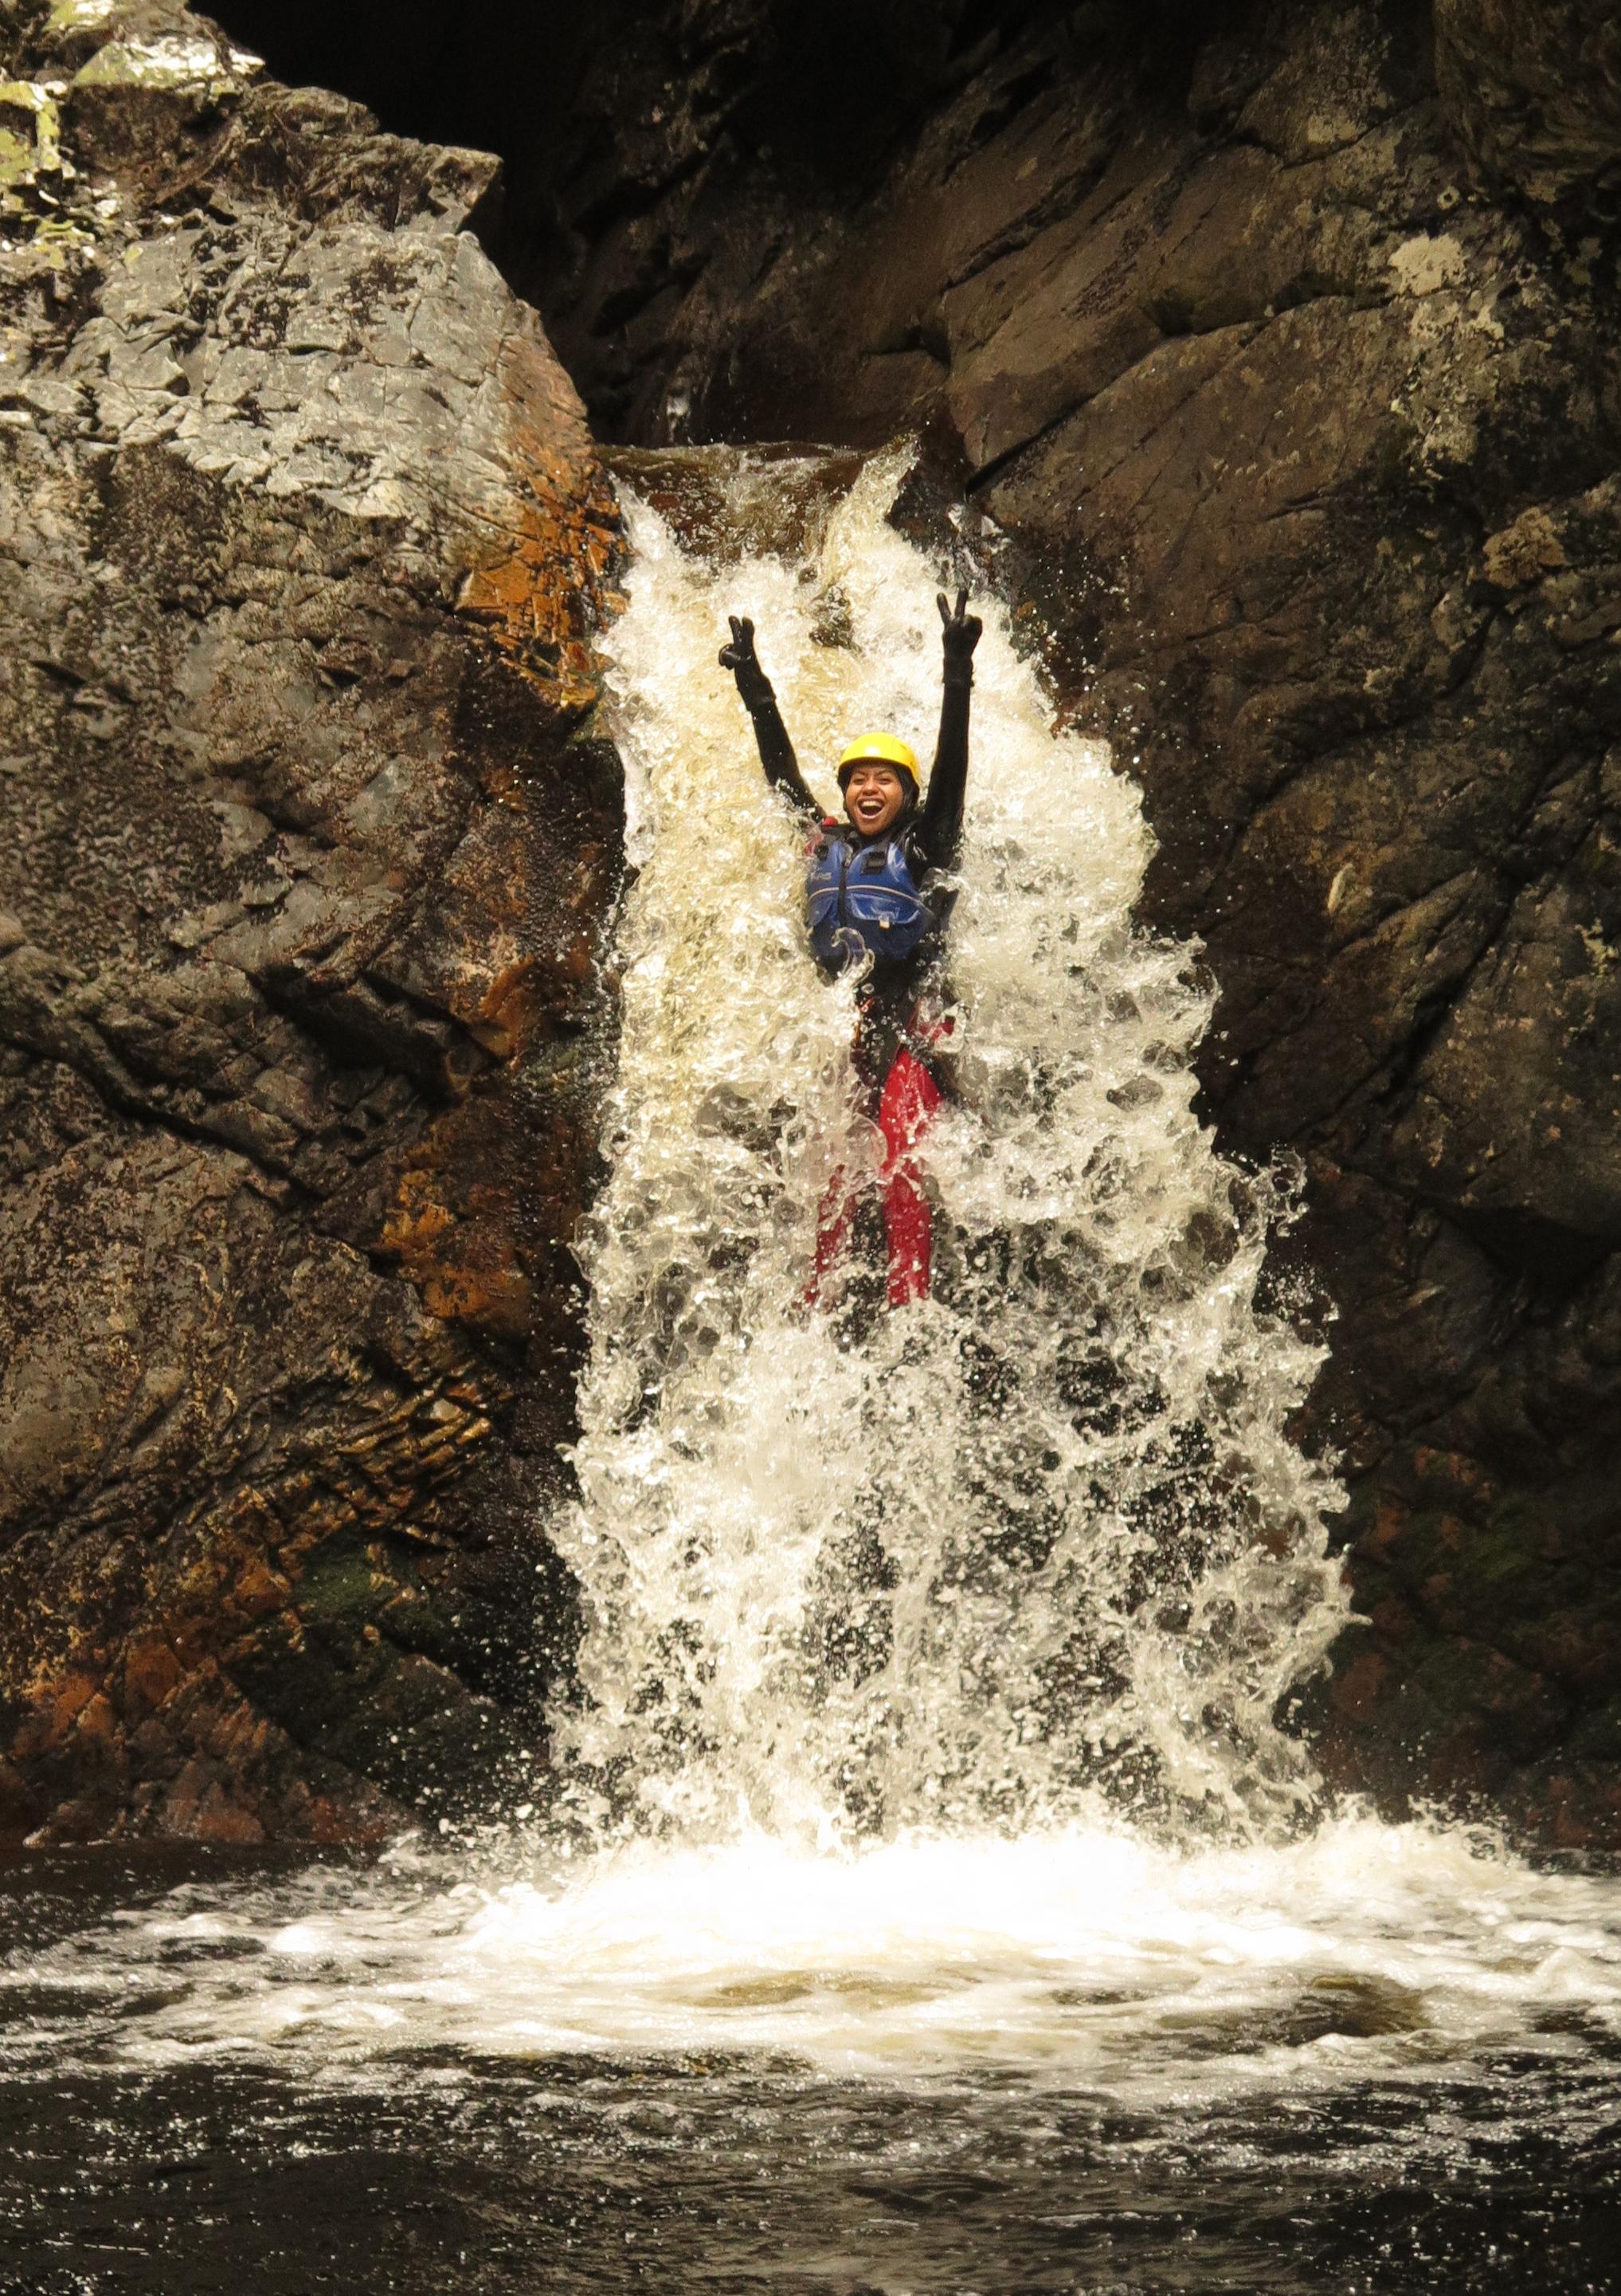 Waterfall slide on canyoning tour, Cradle Mountain, Tasmania